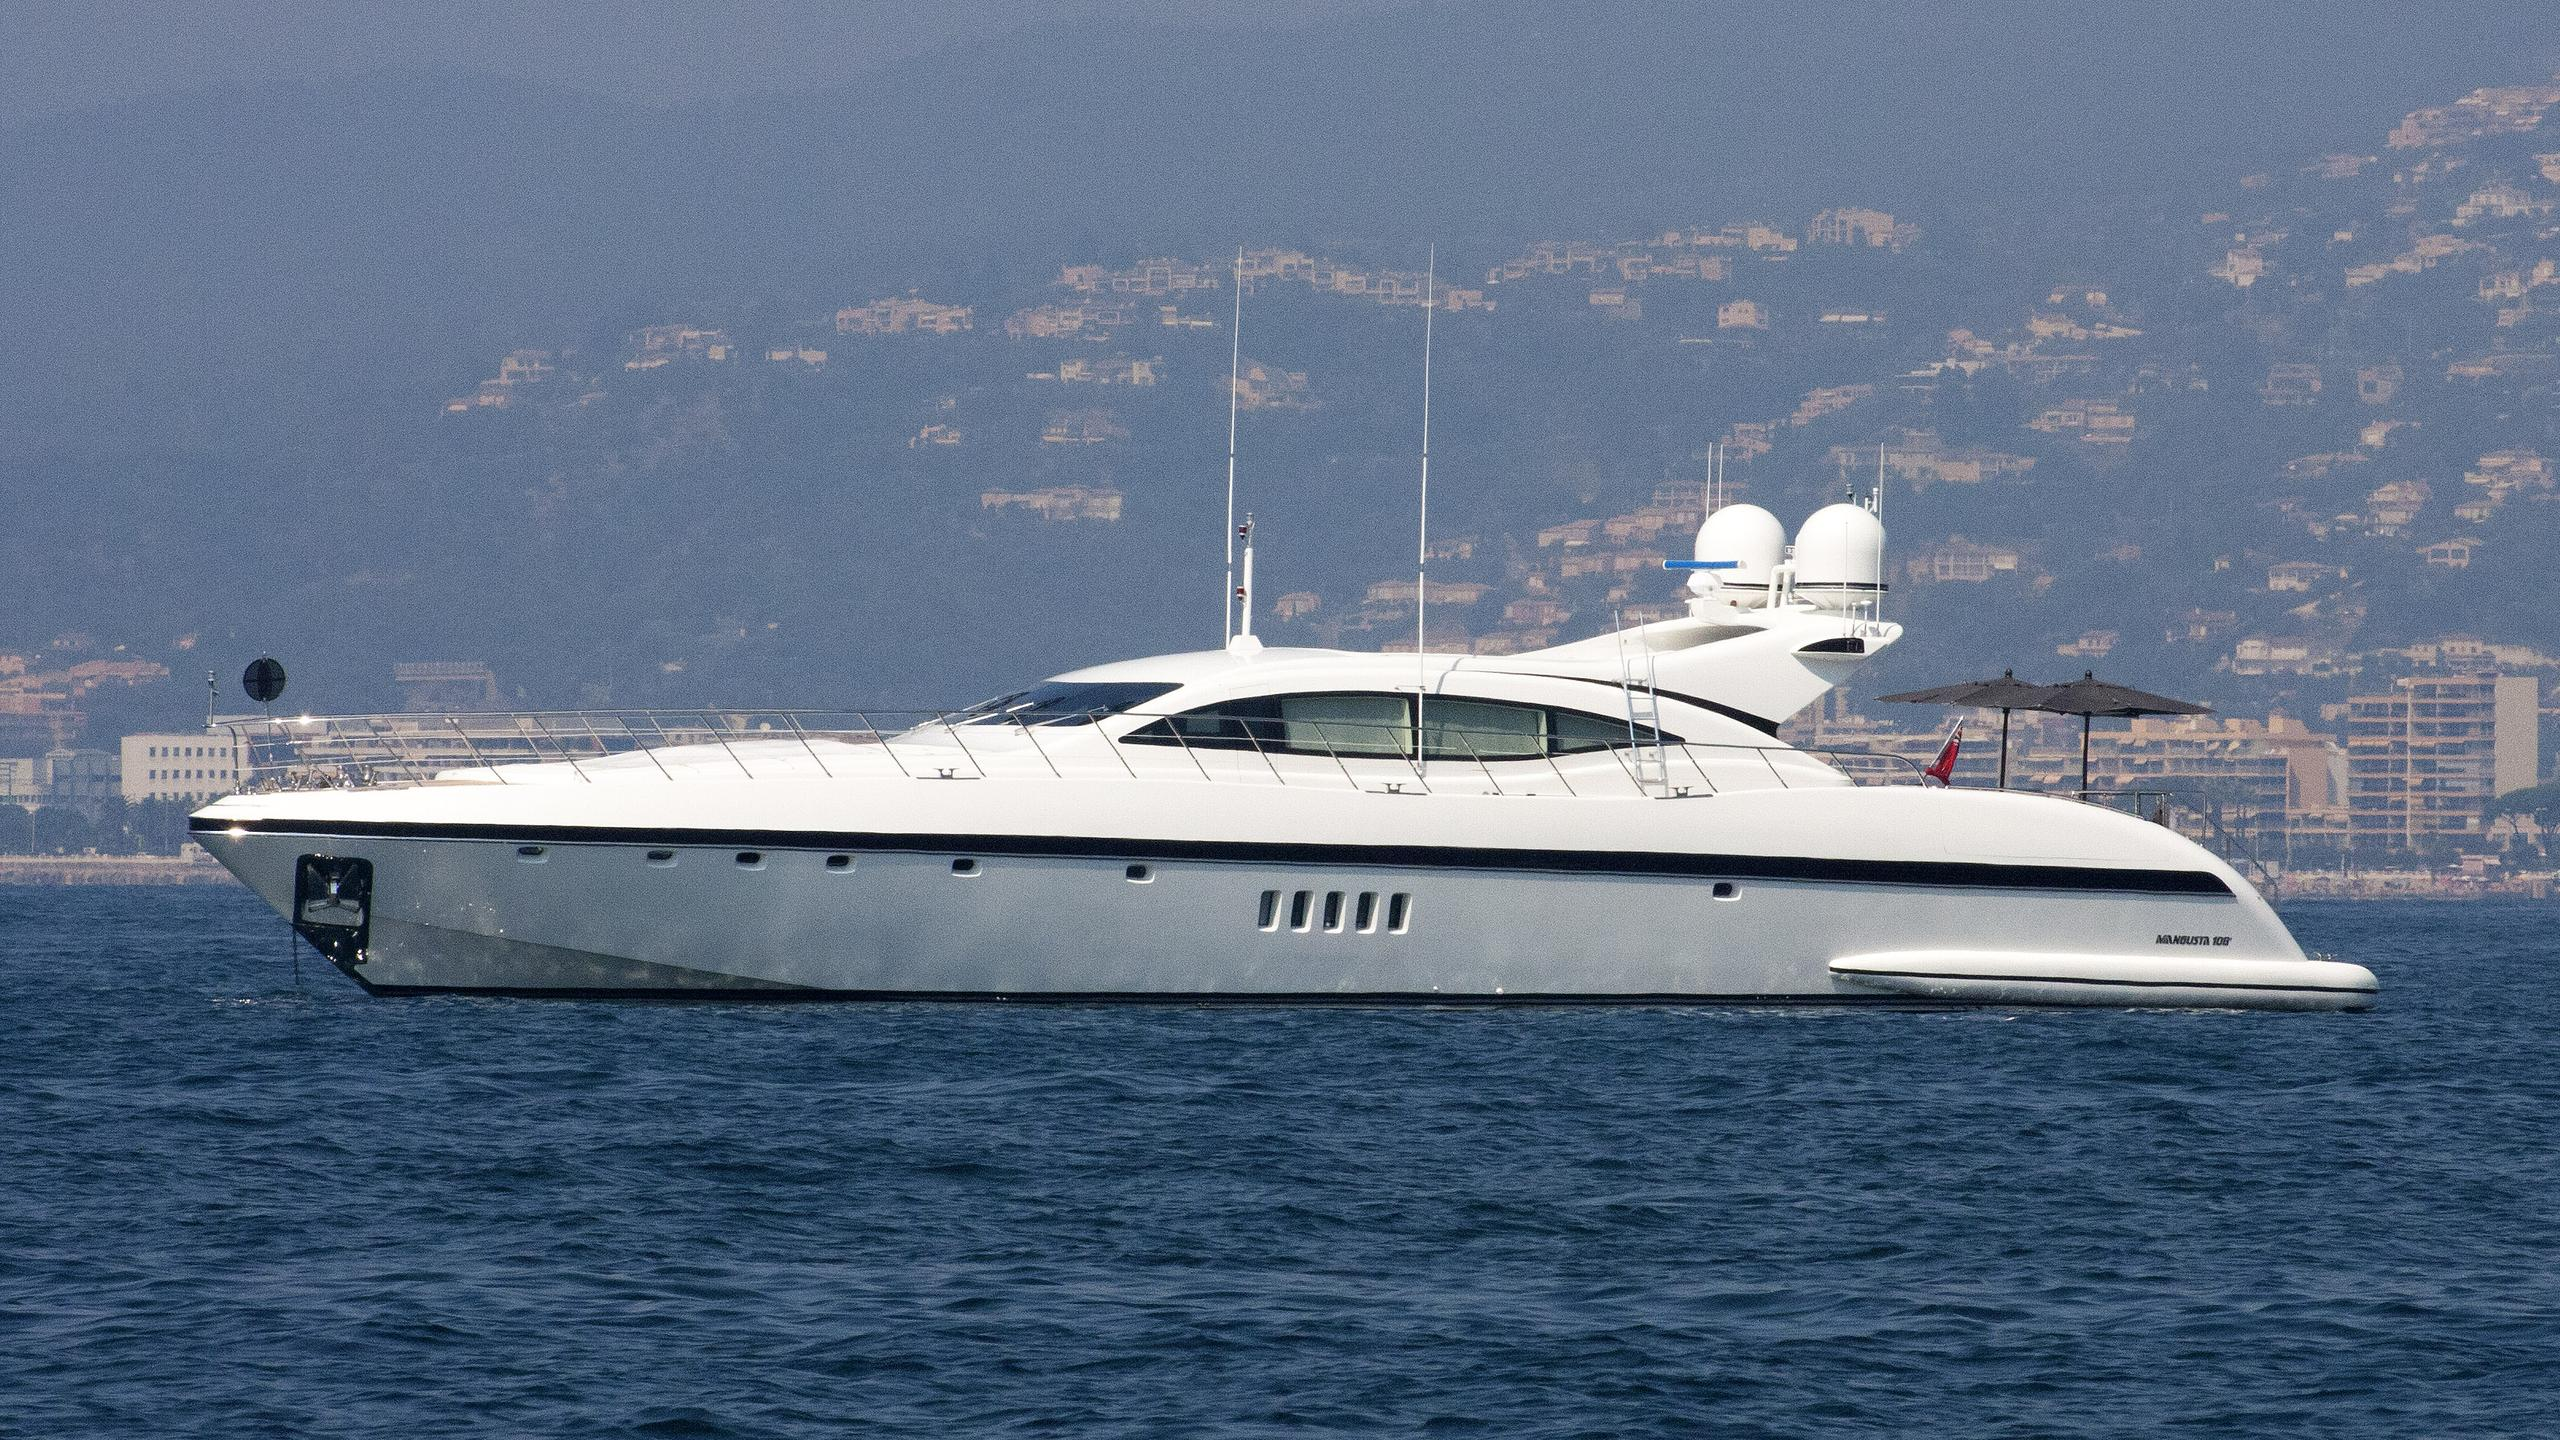 lion-chase-motor-yacht-overmarine-mangusta-108-sport-2008-33m-profile